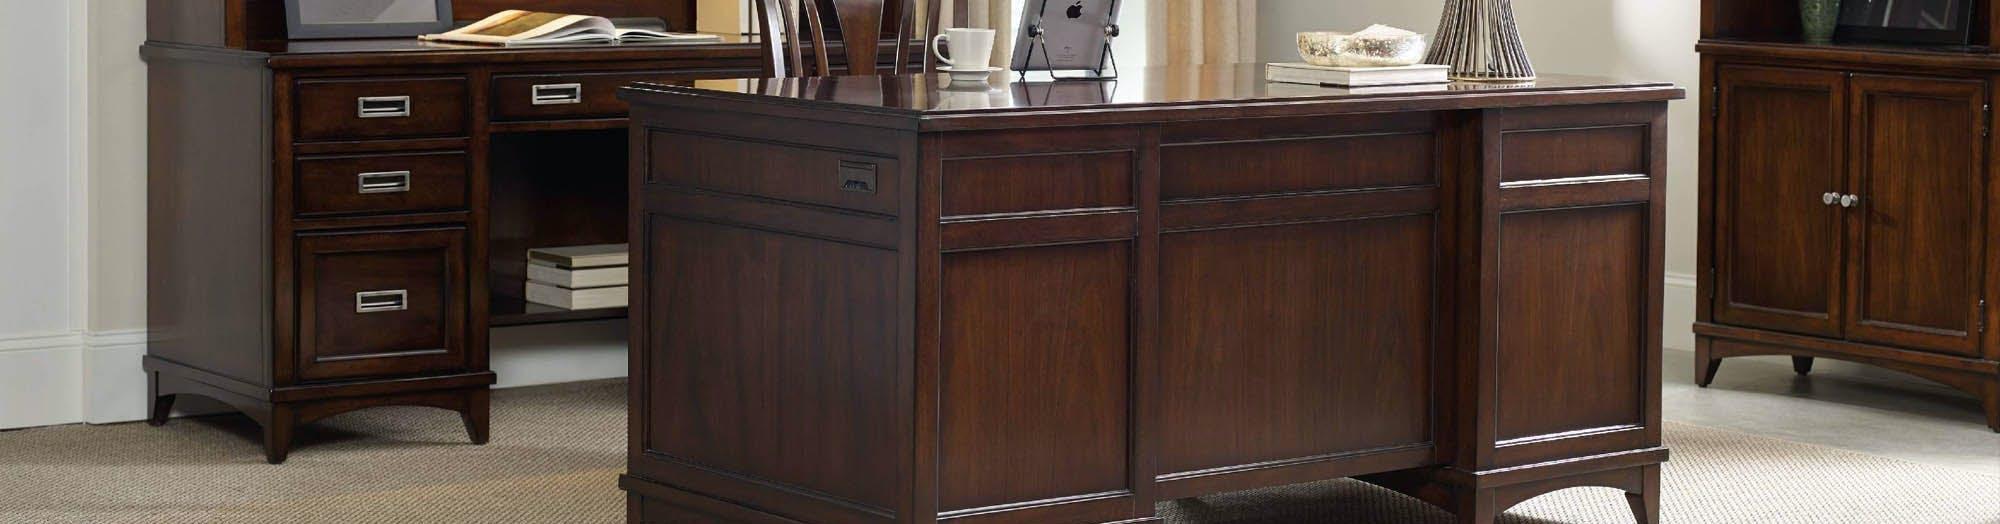 Home Office Furniture Cincinnati ergonomic office furniture Shop For Desks In Cincinnati And Dayton Oh